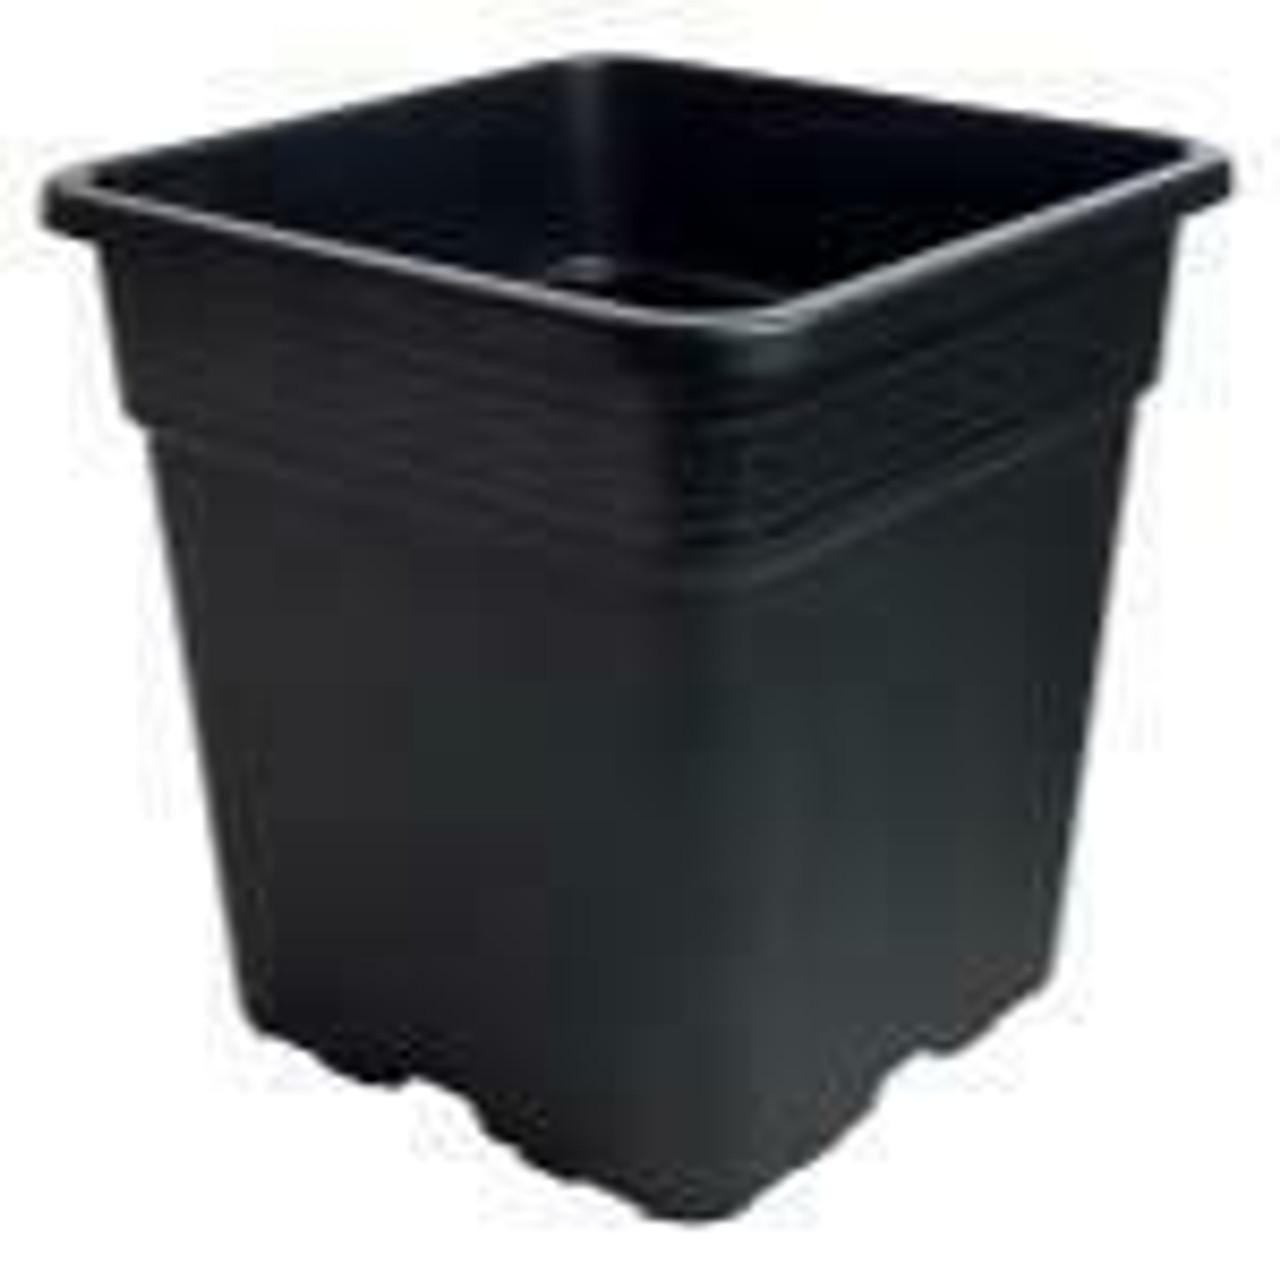 Gro Pro Black Square Pot 5 Gallon - 1